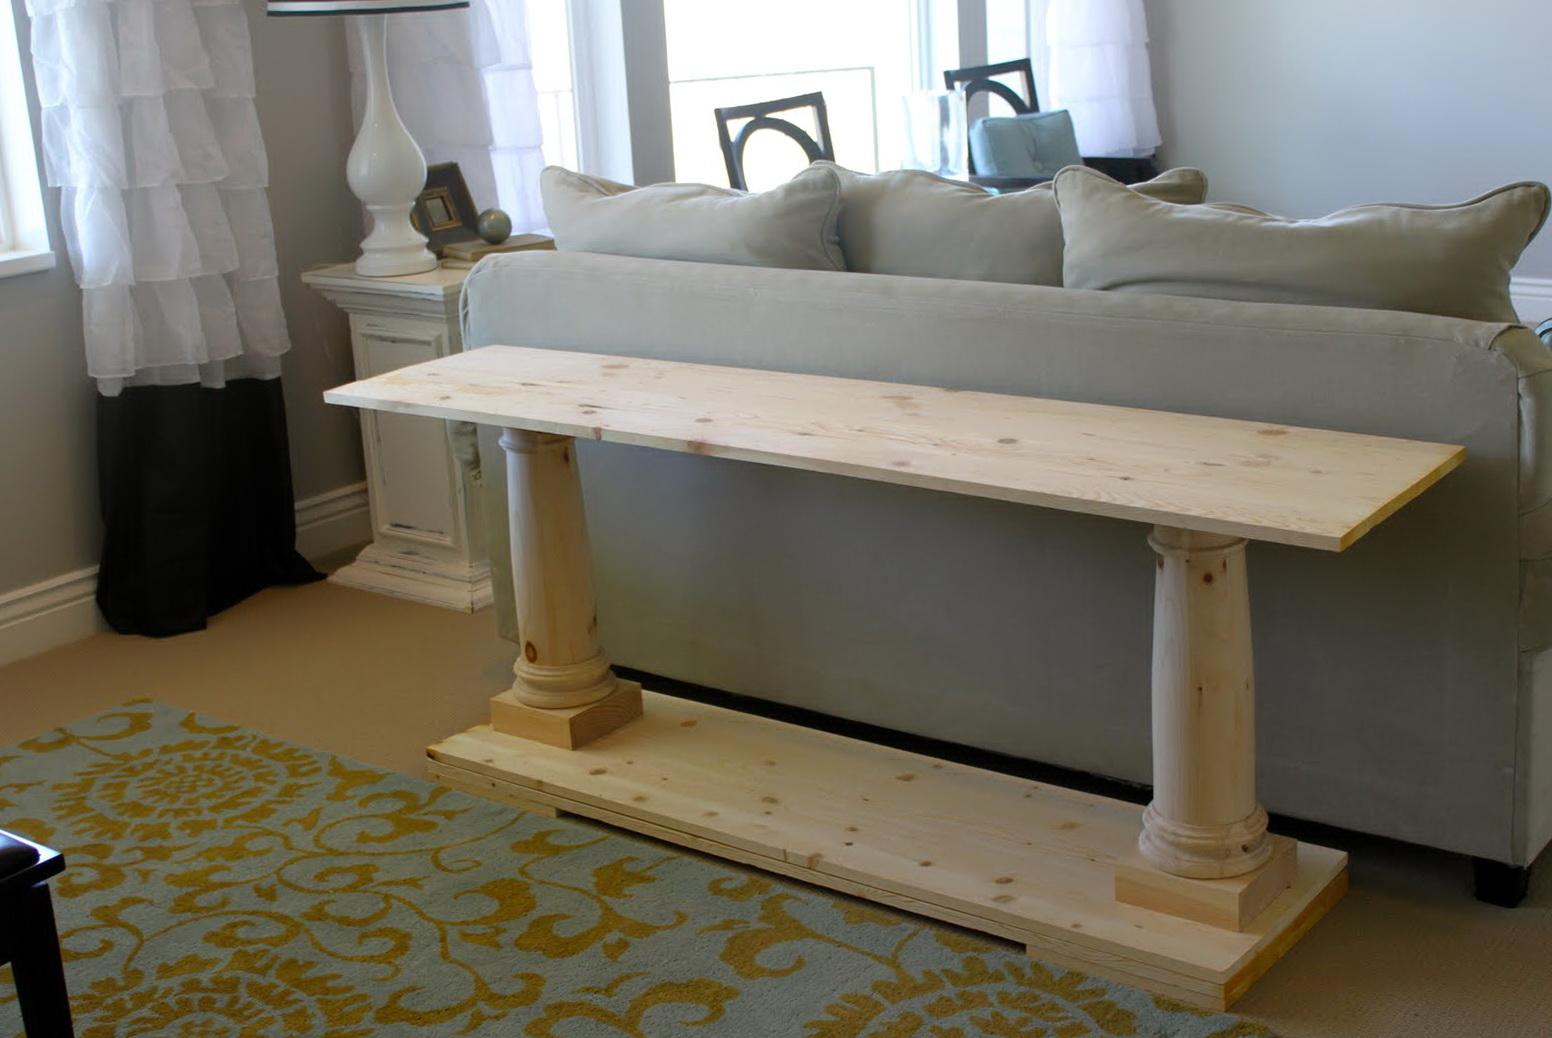 Restoration Hardware Sofa Table